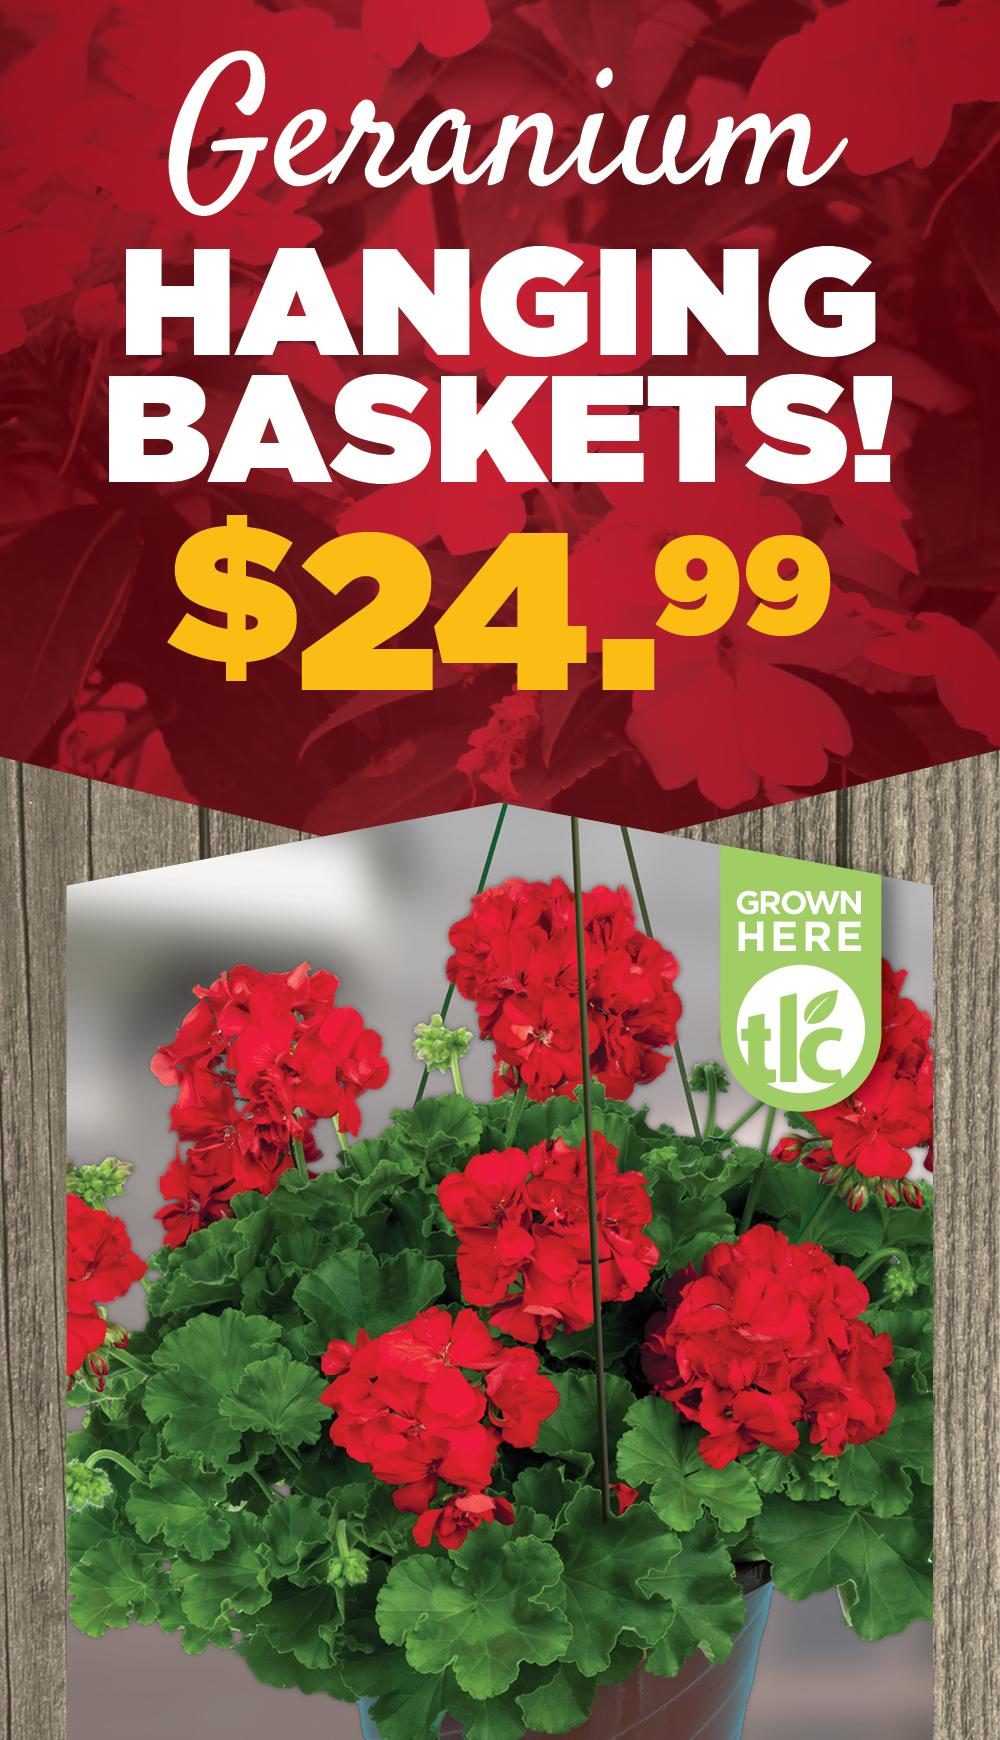 Geranium Hanging Baskets | TLC Garden Centers